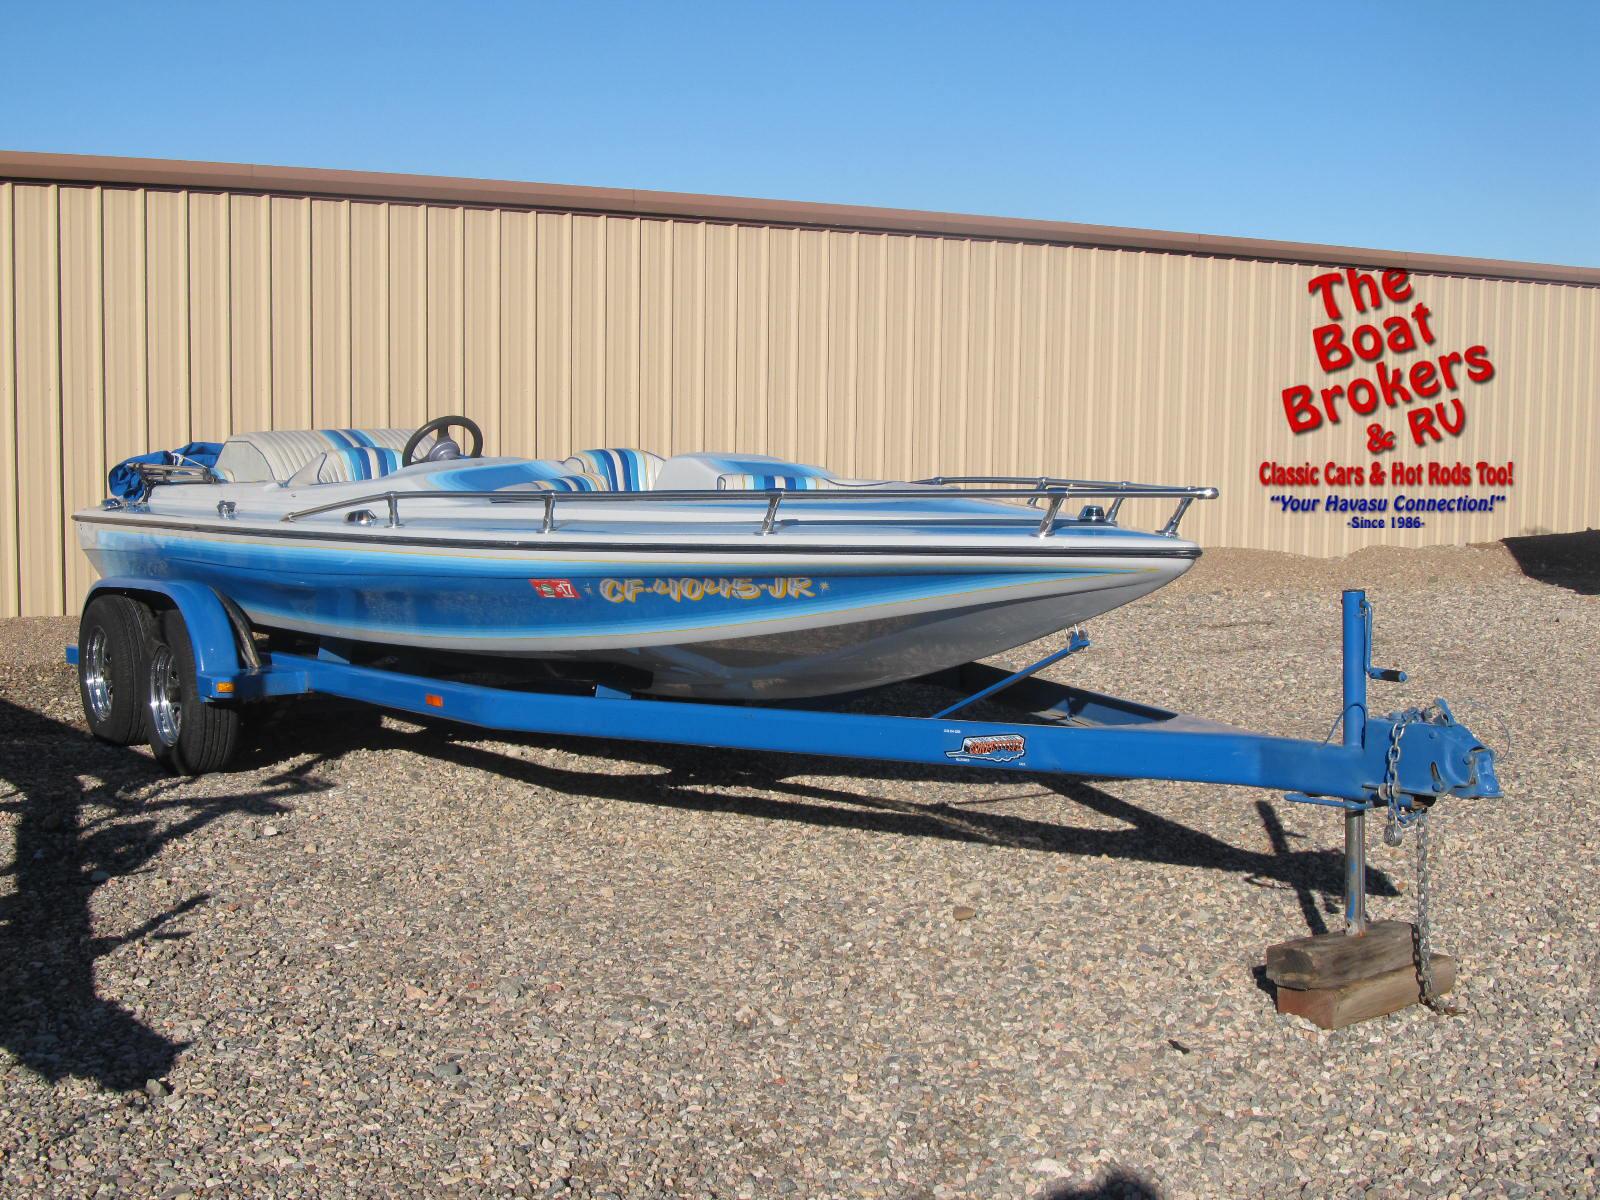 triumph boats for sale boats com rh boats com Triumph Fishing Boats Triumph Fishing Boats